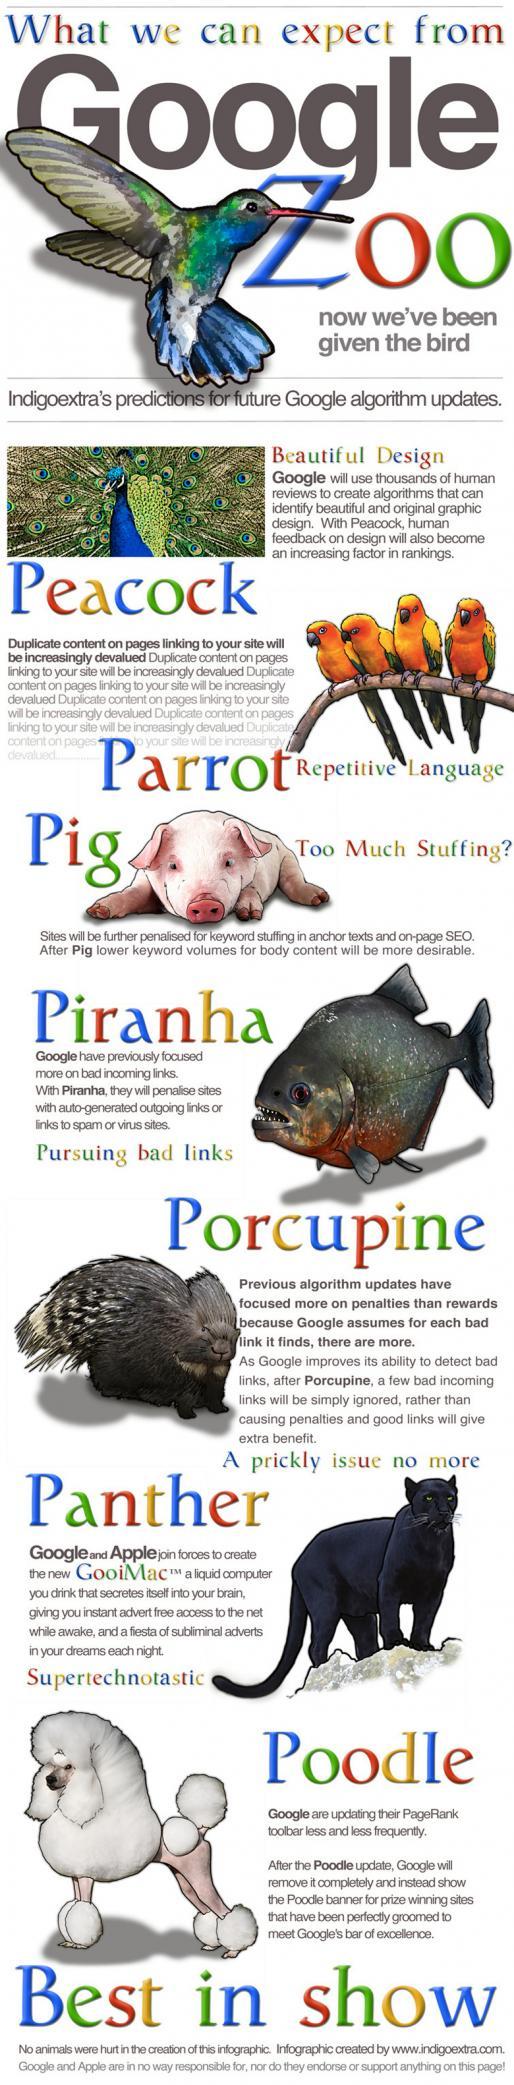 Educational digital marketing infographic - Google zoo